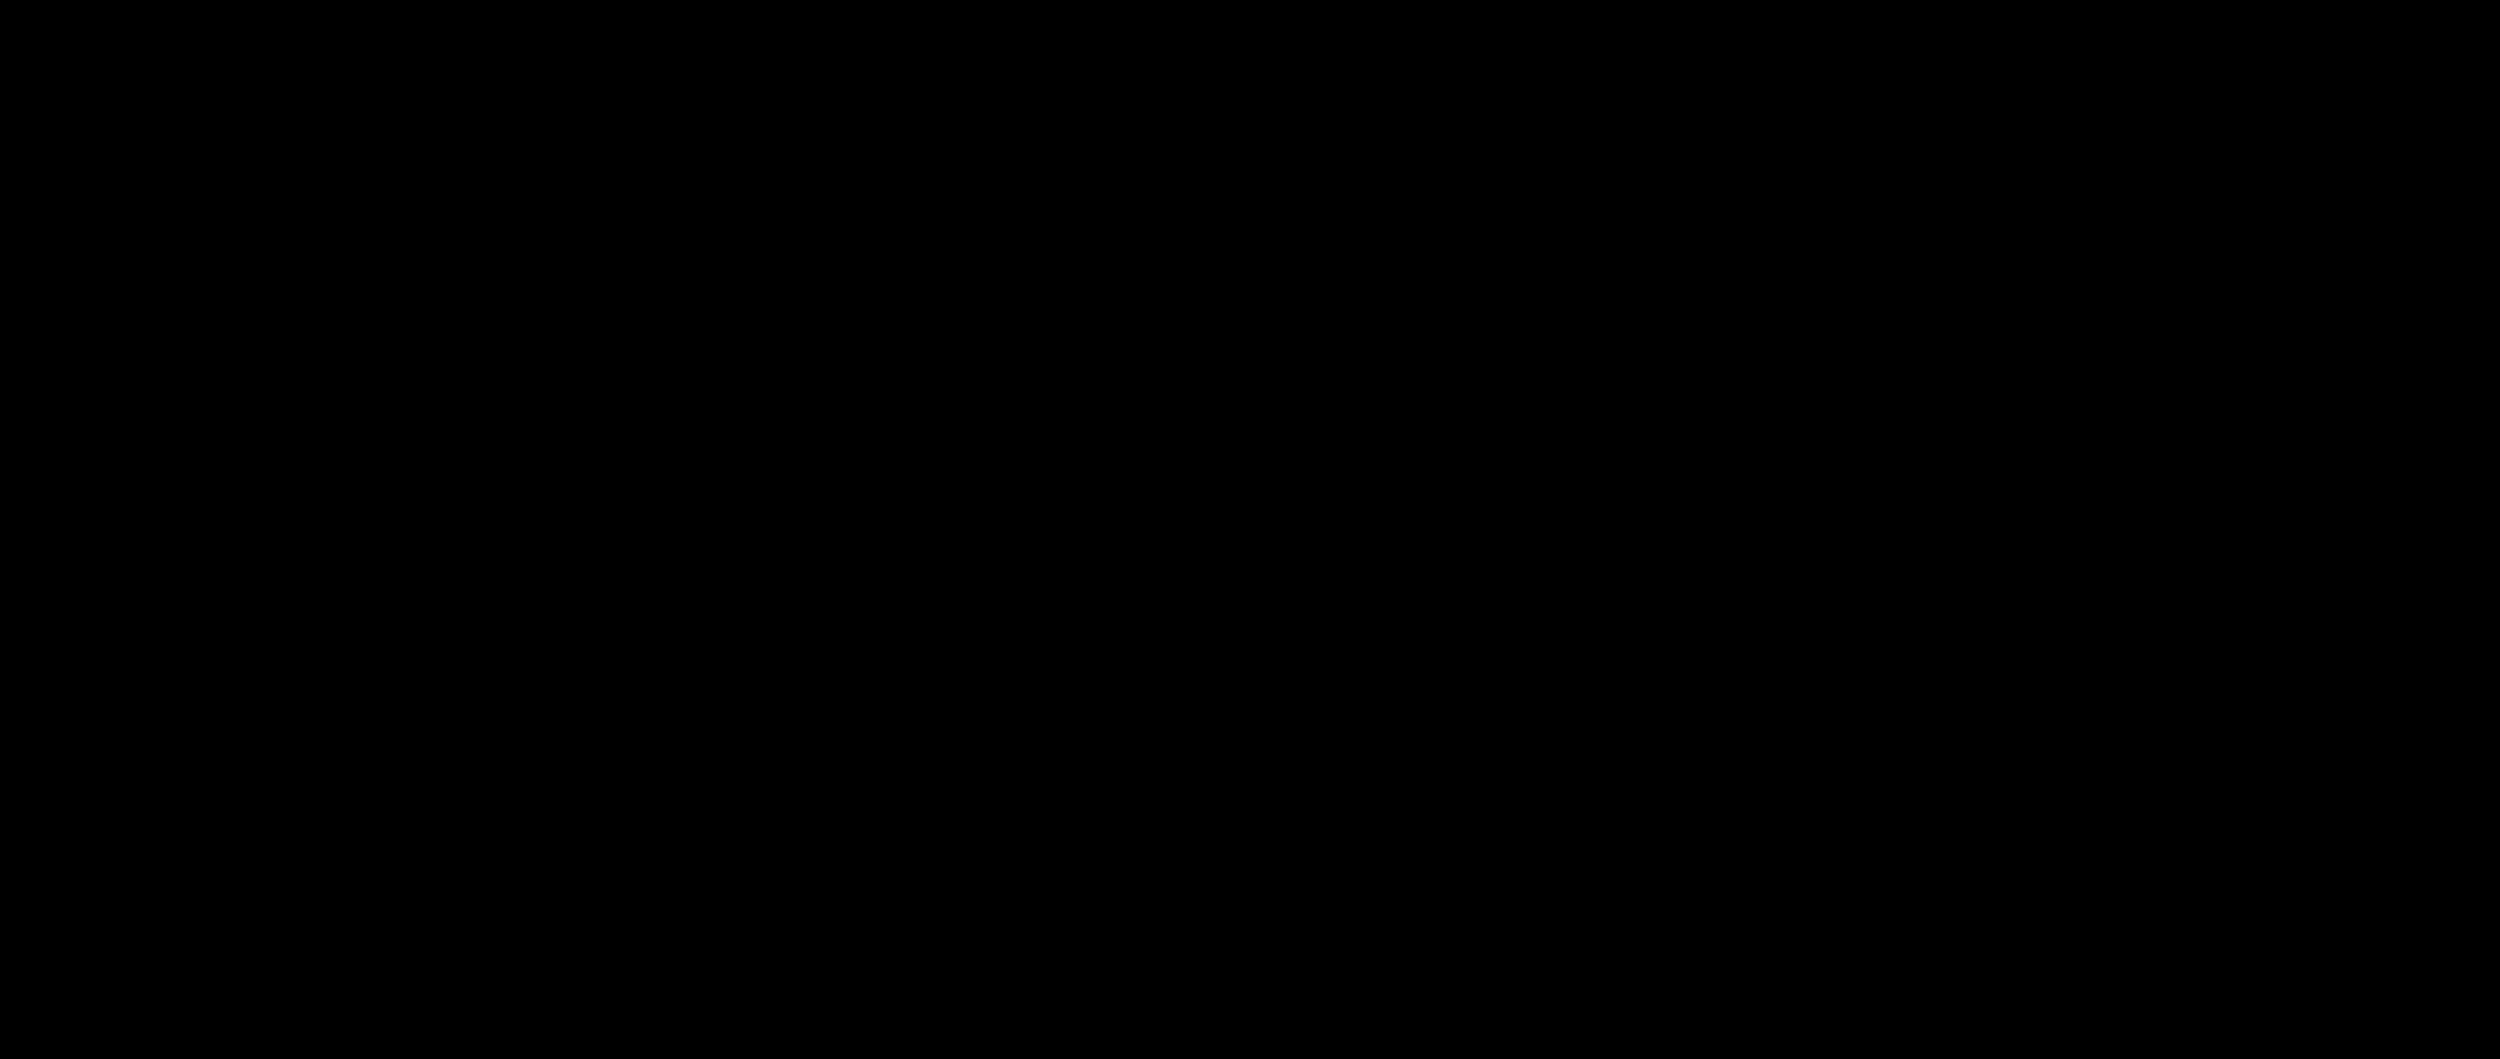 KASZ logo artboards_KASZ 2 line black.png